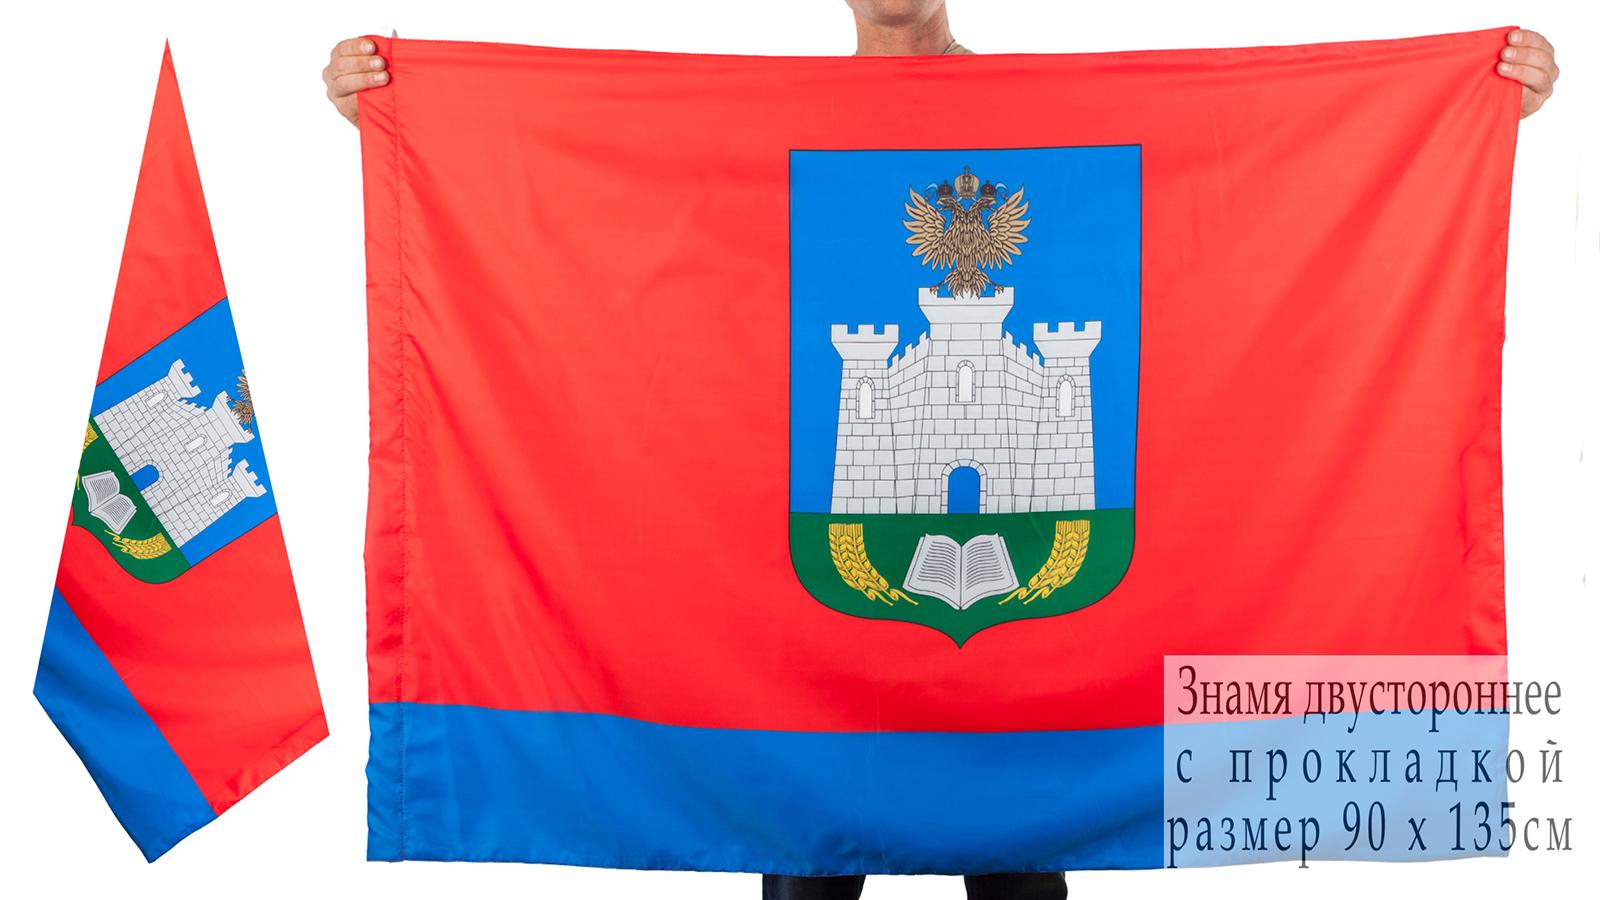 Двухсторонний флаг Орловской области